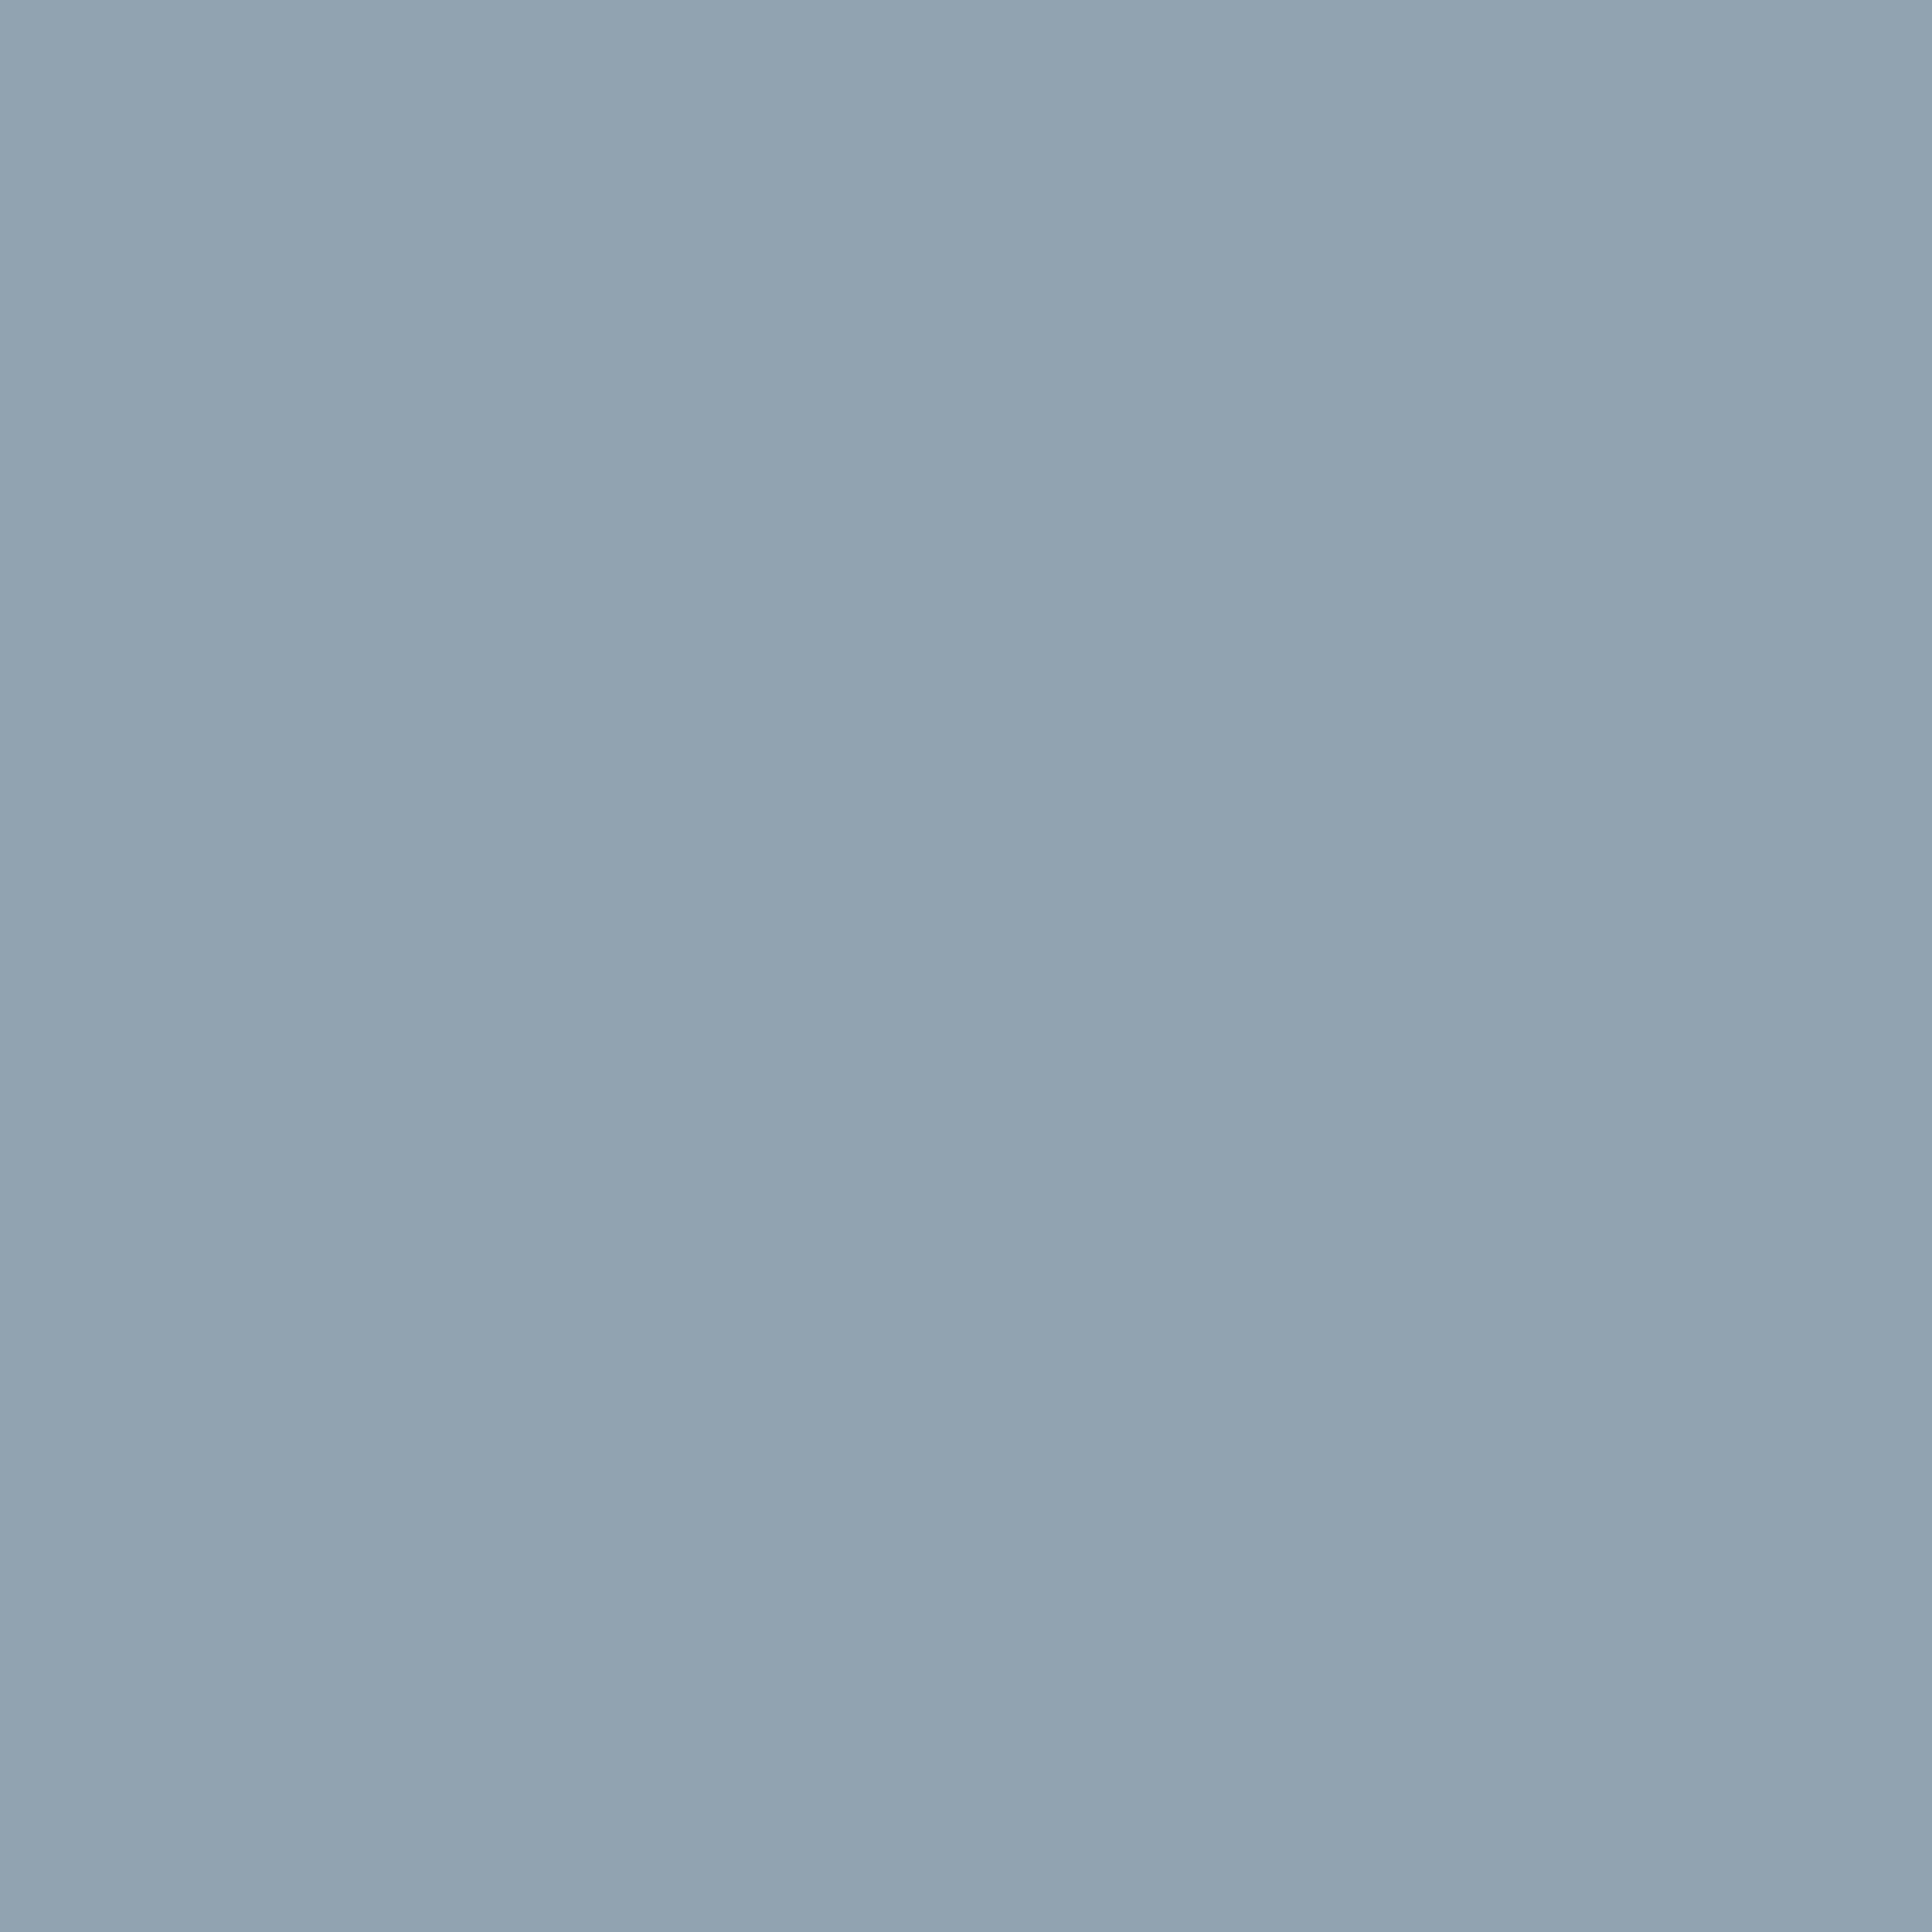 2048x2048 Cadet Grey Solid Color Background